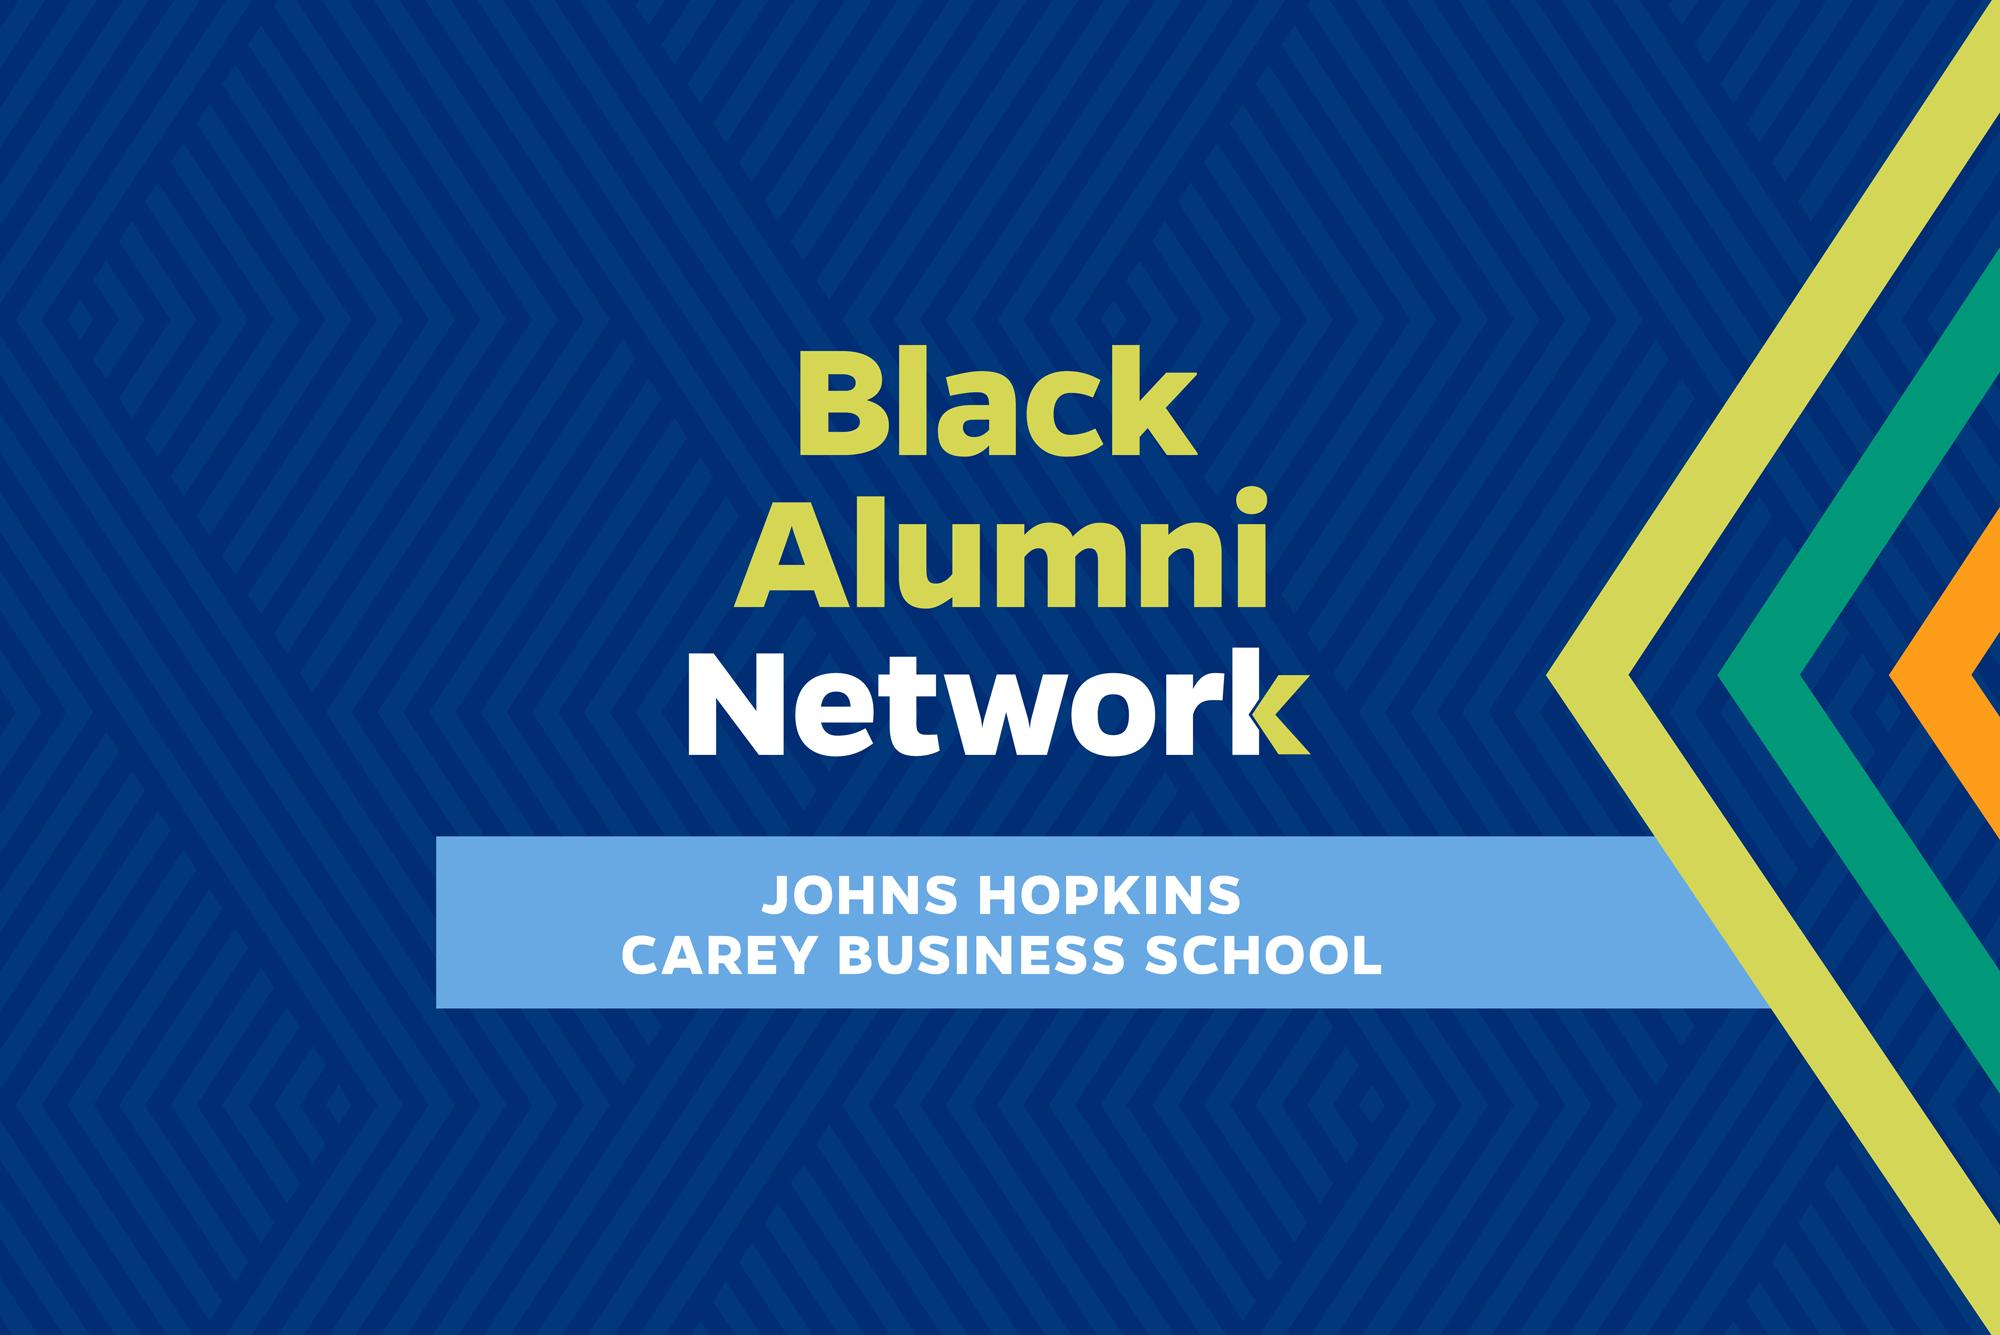 Black Alumni Network